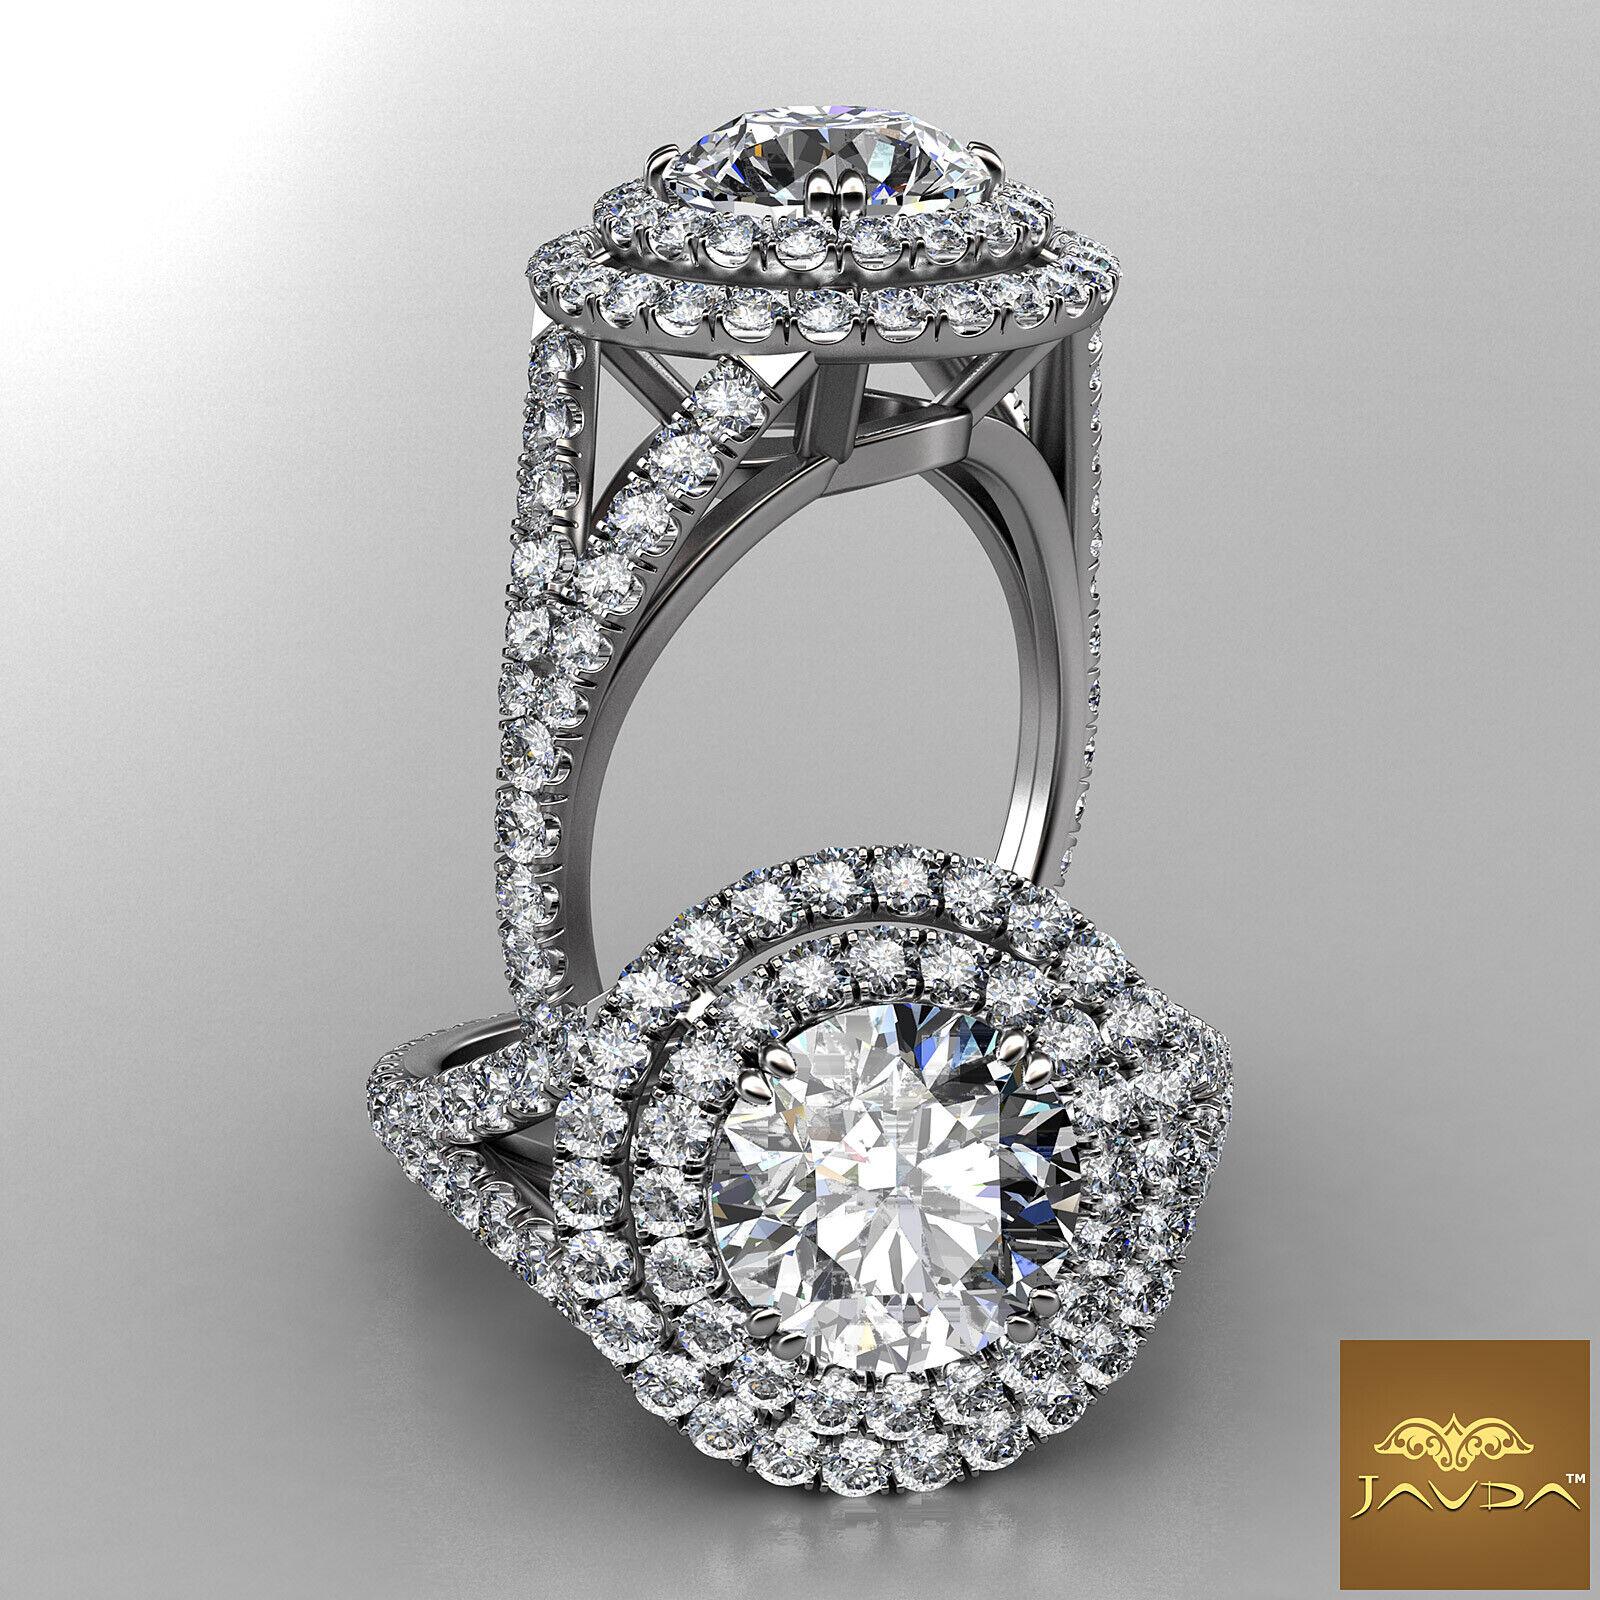 2.46ctw Double Halo Split Shank Round Diamond  Engagement Ring GIA F-VVS1 w Gold